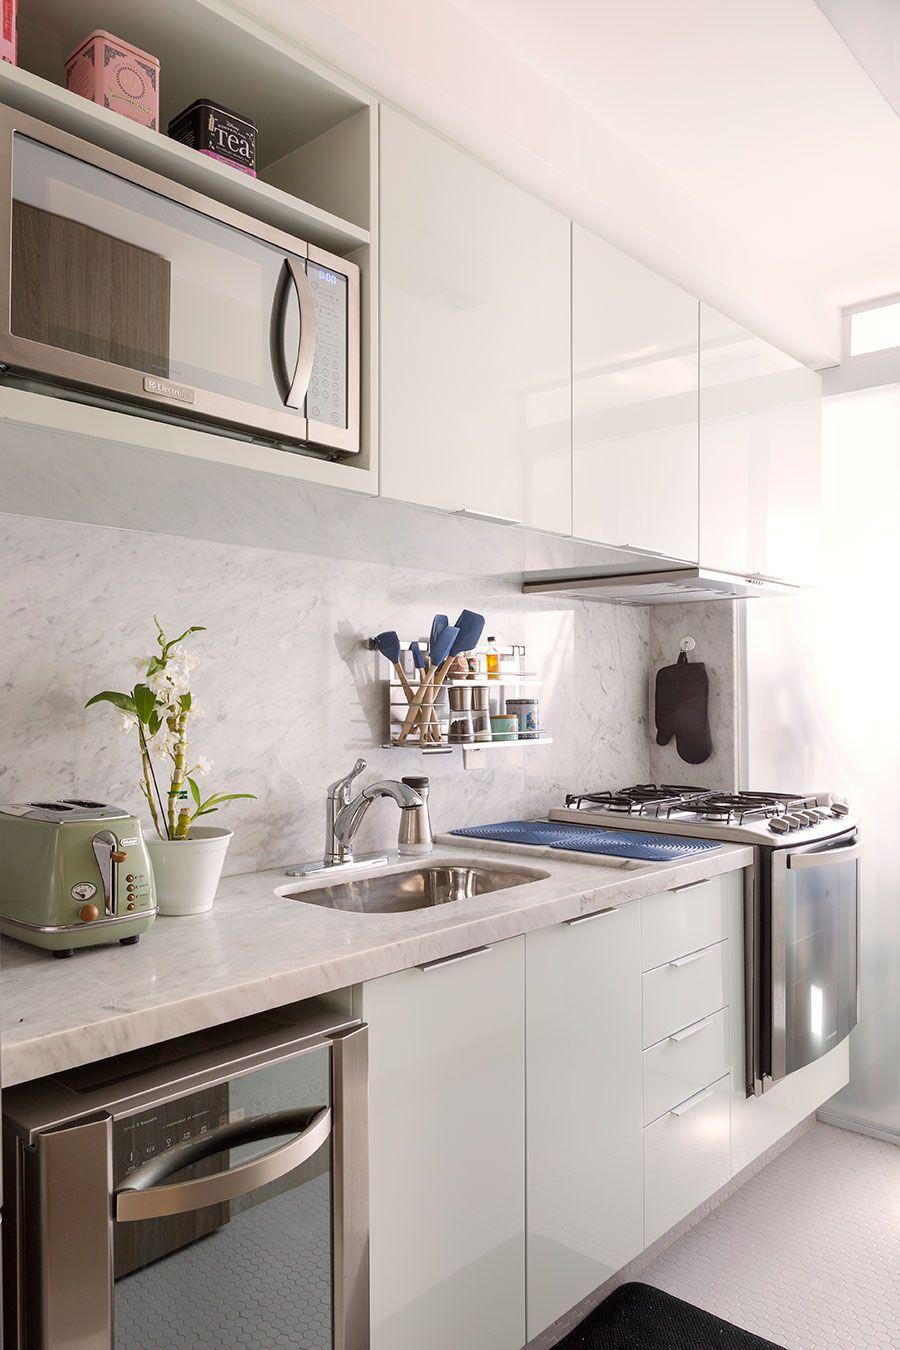 OPEN HOUSE | Neid, Innendekoration und Küche